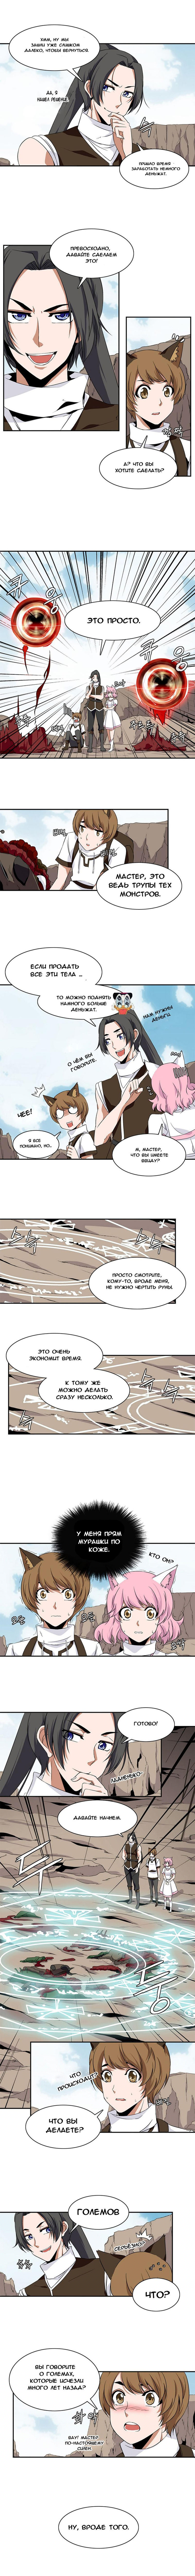 https://r1.ninemanga.com/comics/pic2/48/28784/301760/1462867592900.jpg Page 2